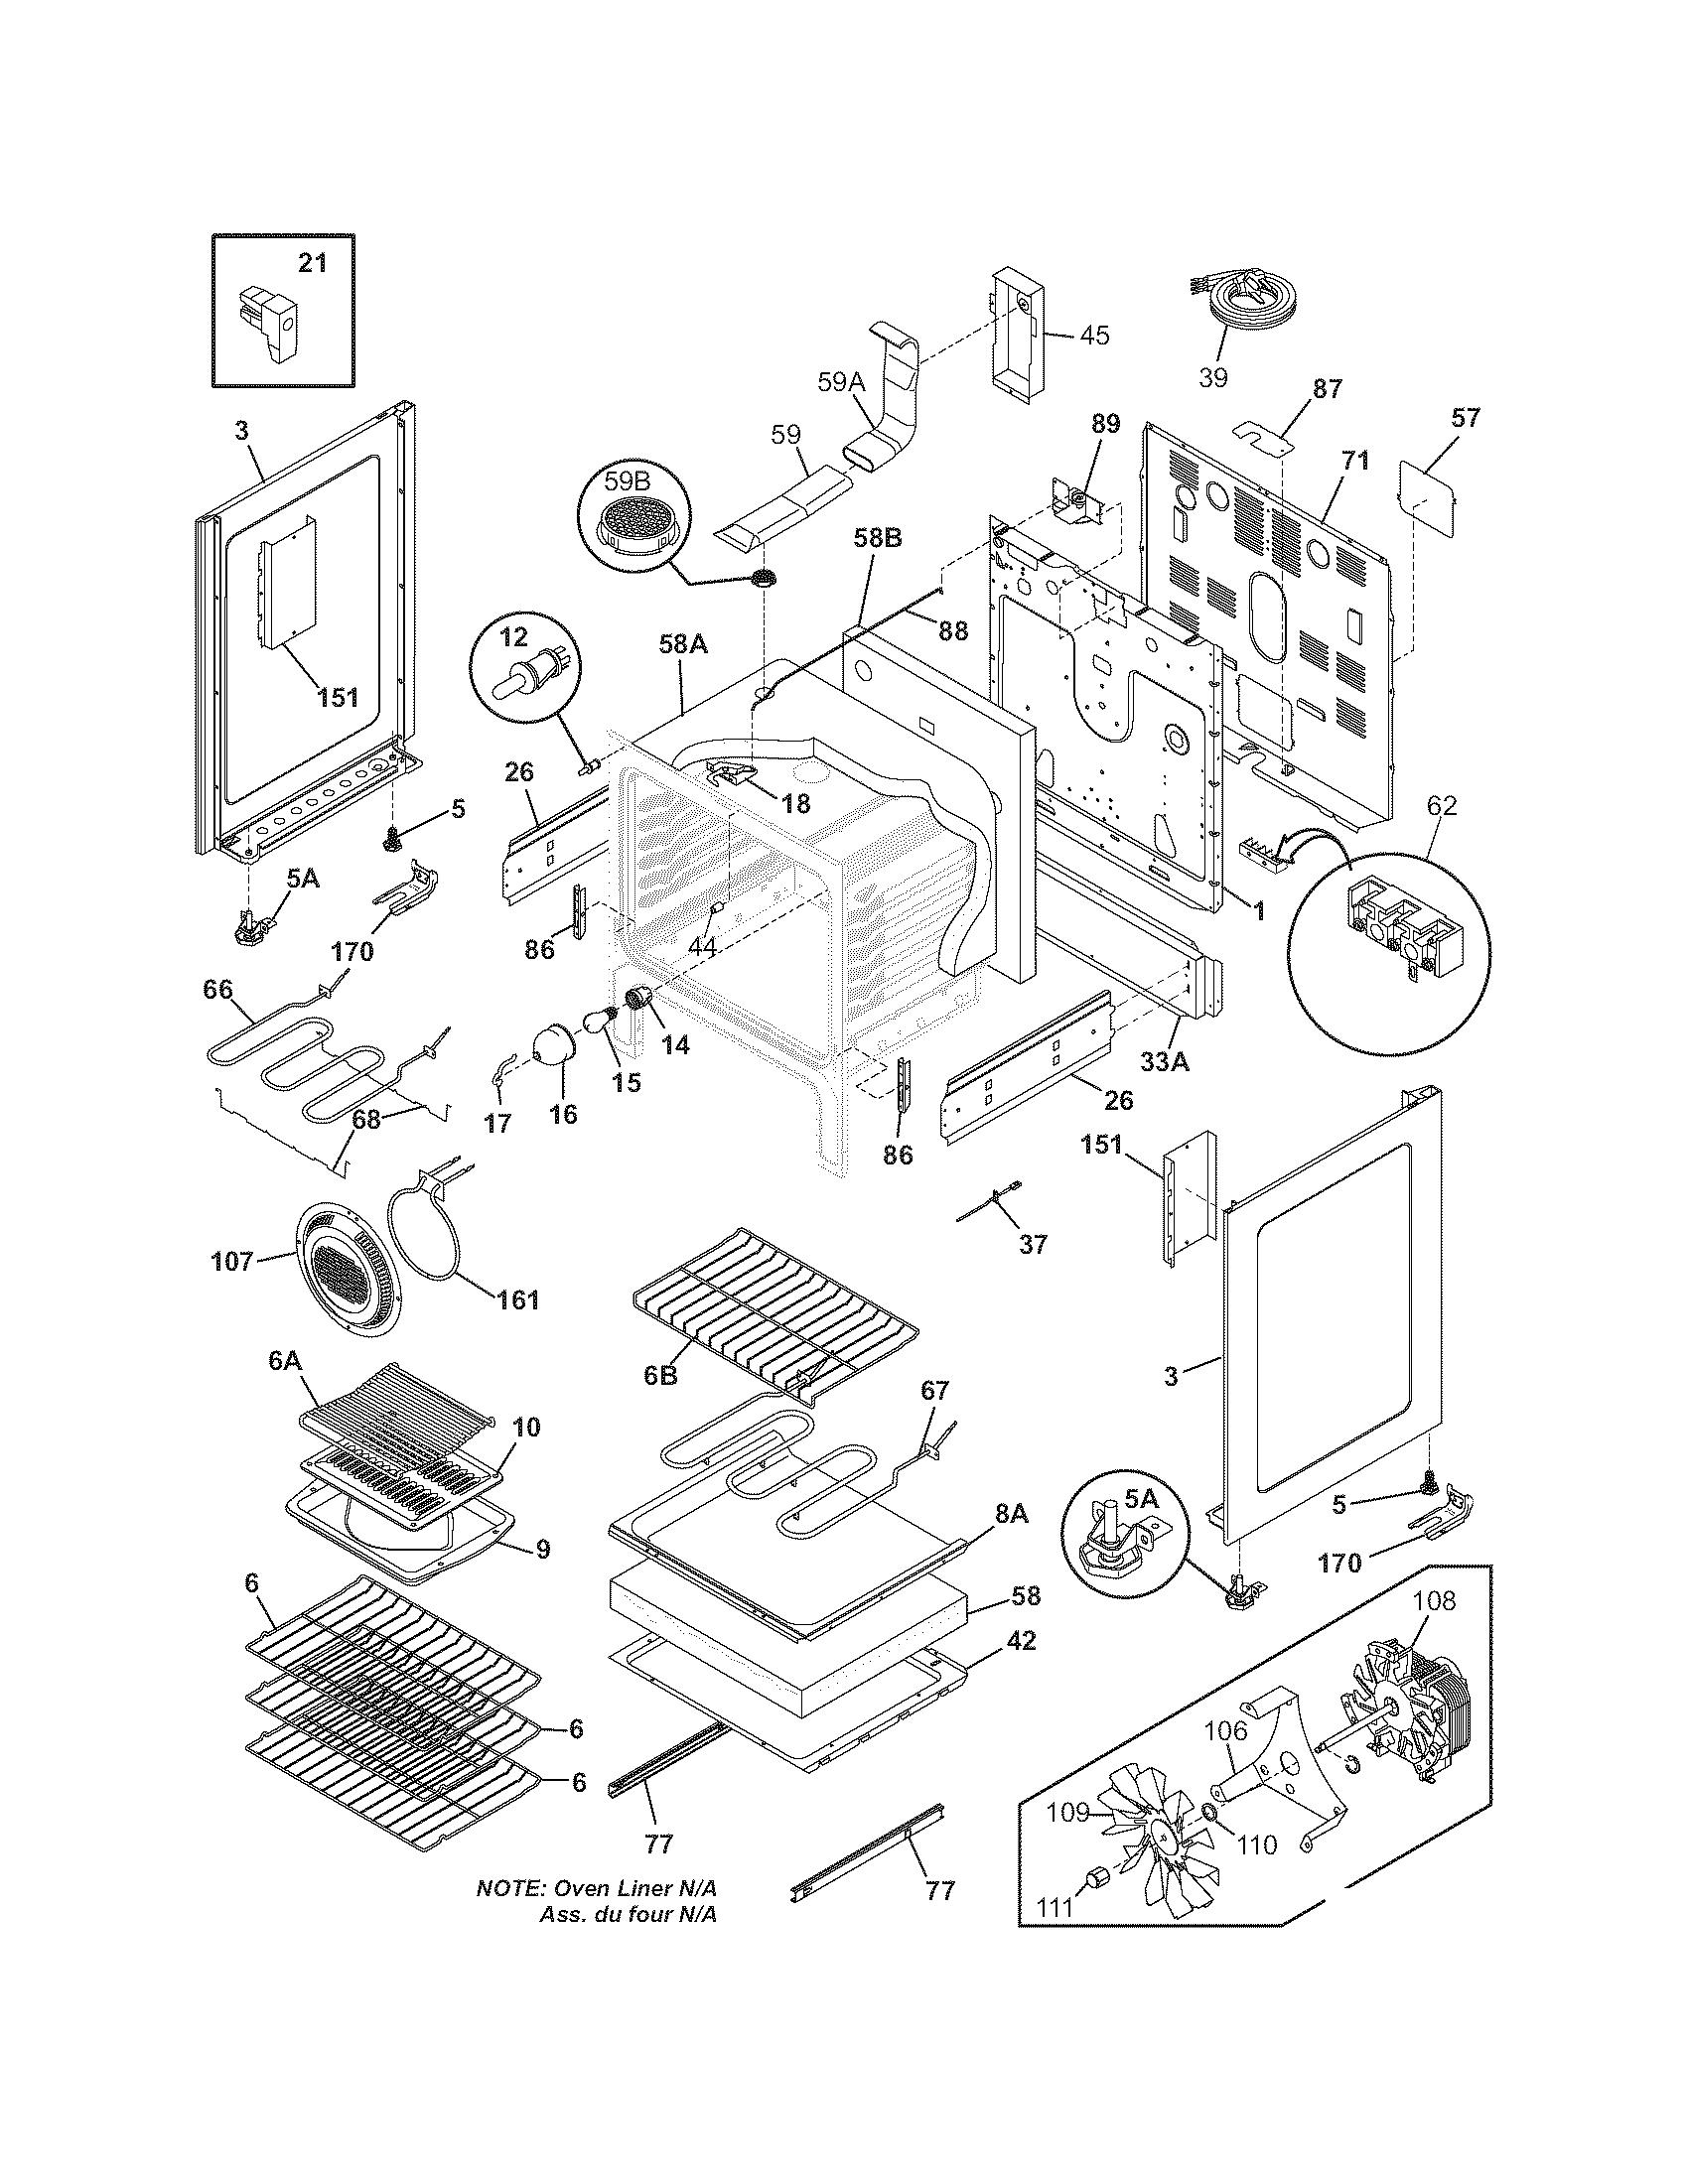 body parts?resize\\\=665%2C861\\\&ssl\\\=1 kenmore coldspot refrigerator wiring diagram kenmore dryer wiring diagram for kenmore elite refrigerator at eliteediting.co